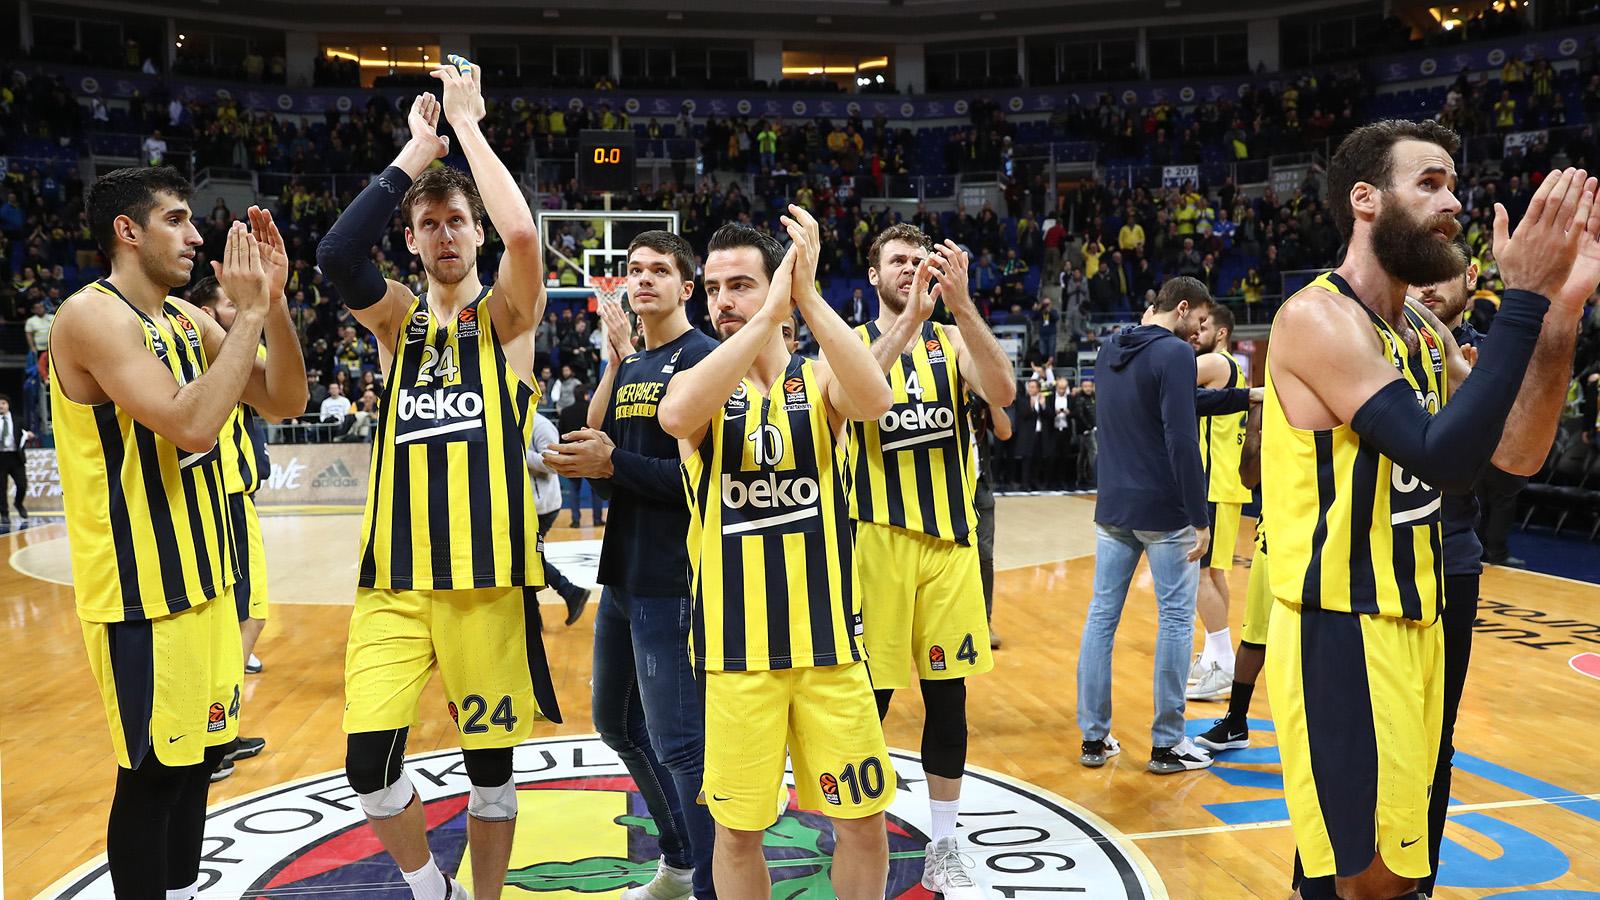 Fenerbahçe Beko'nun konuğu Banvit